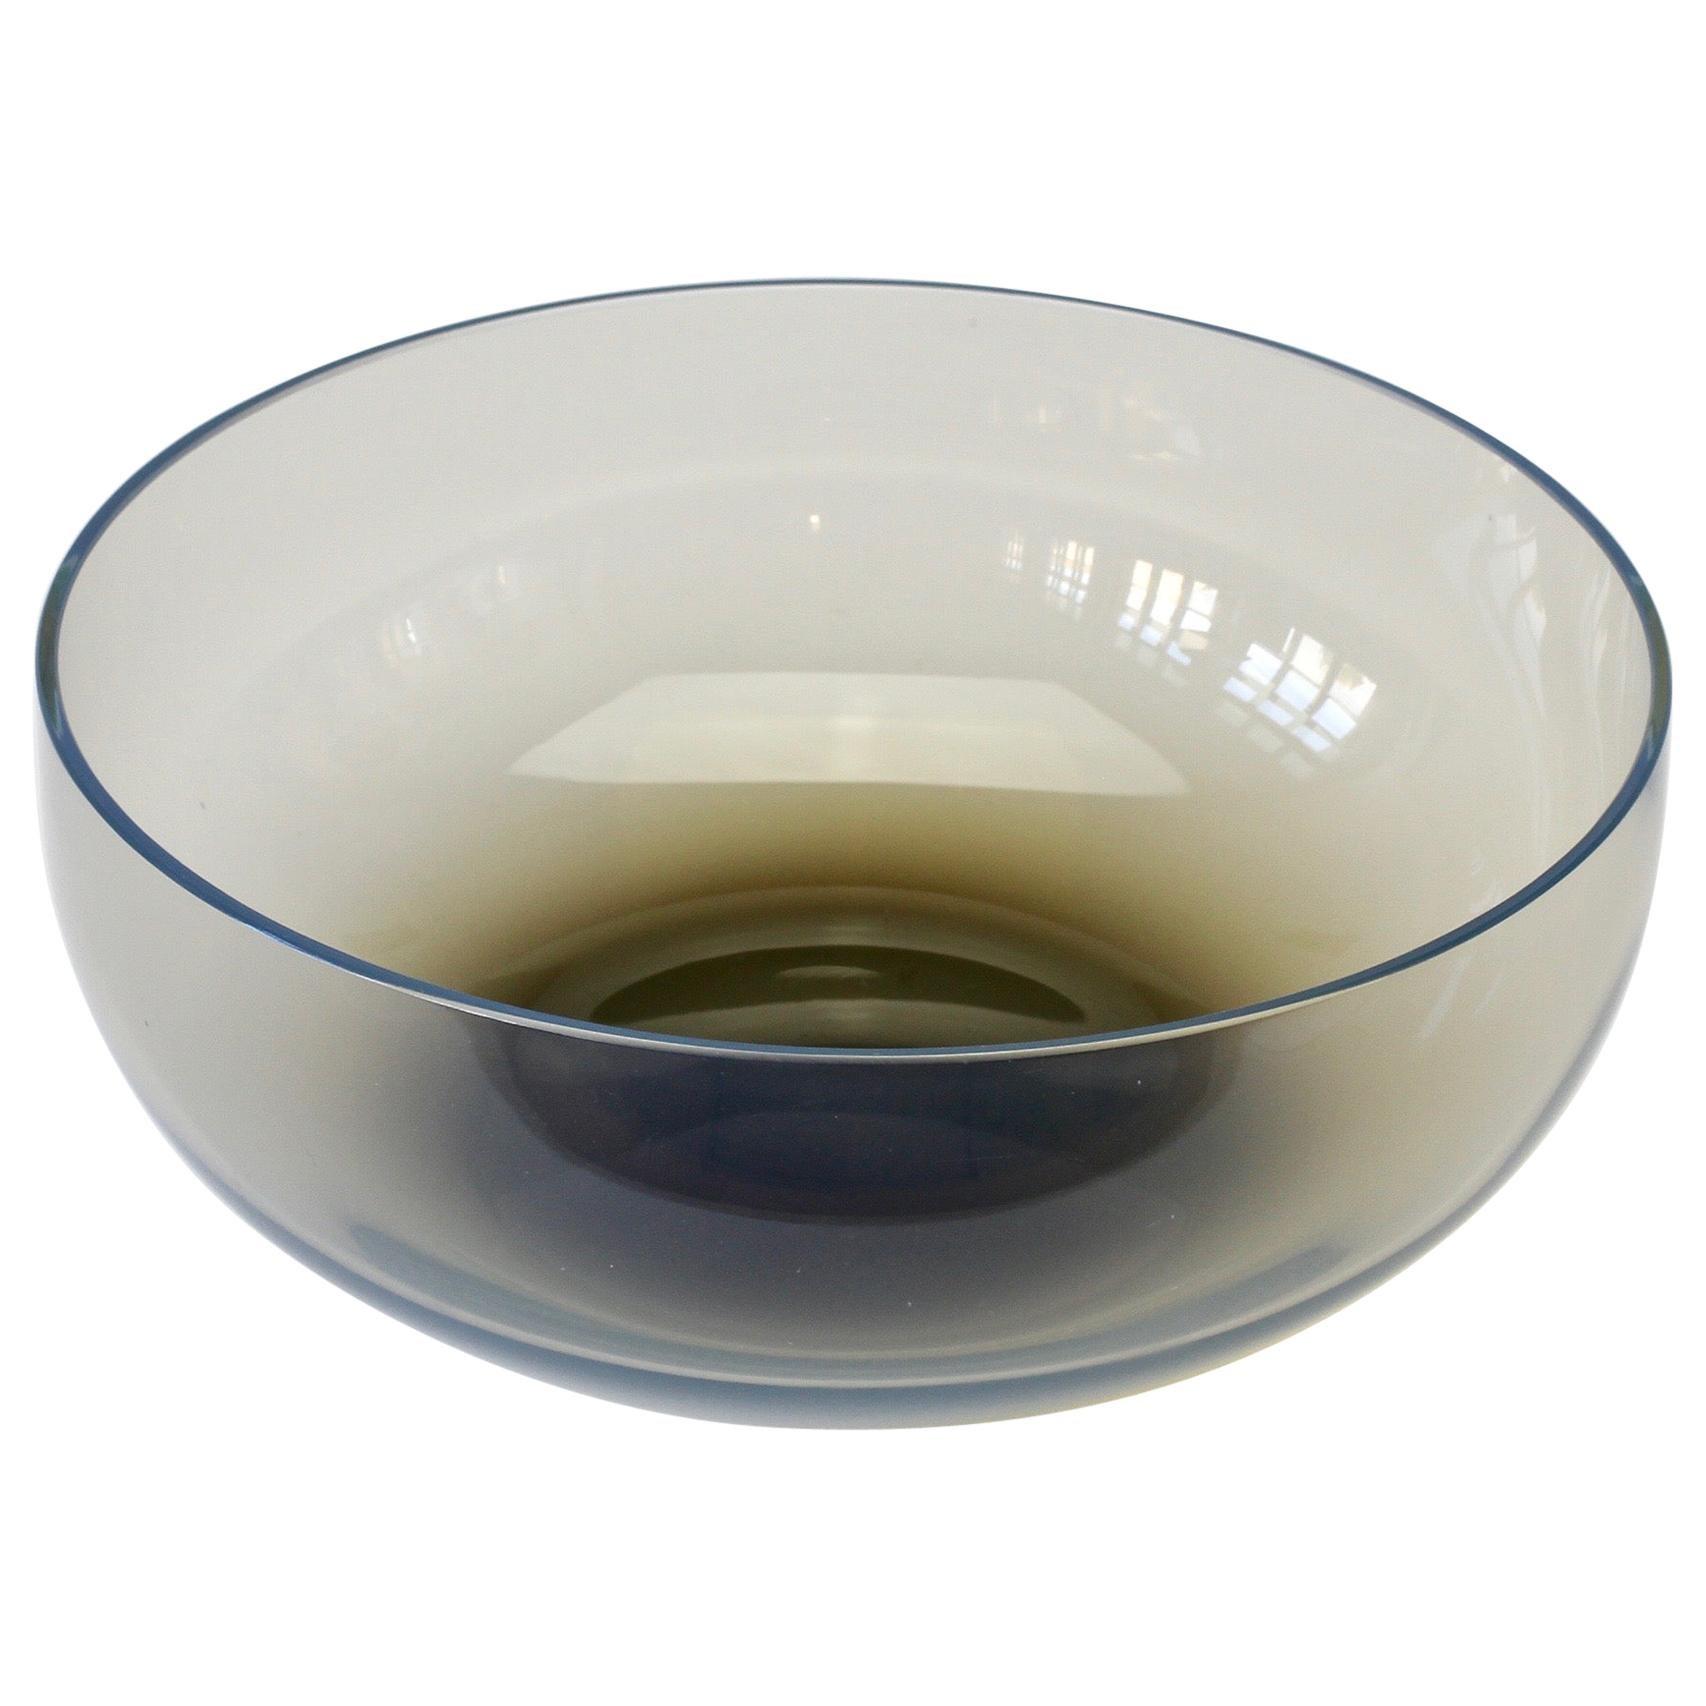 Antonio da Ros for Cenedese 'Smoked' Gray Vintage Murano Glass Bowl or Dish